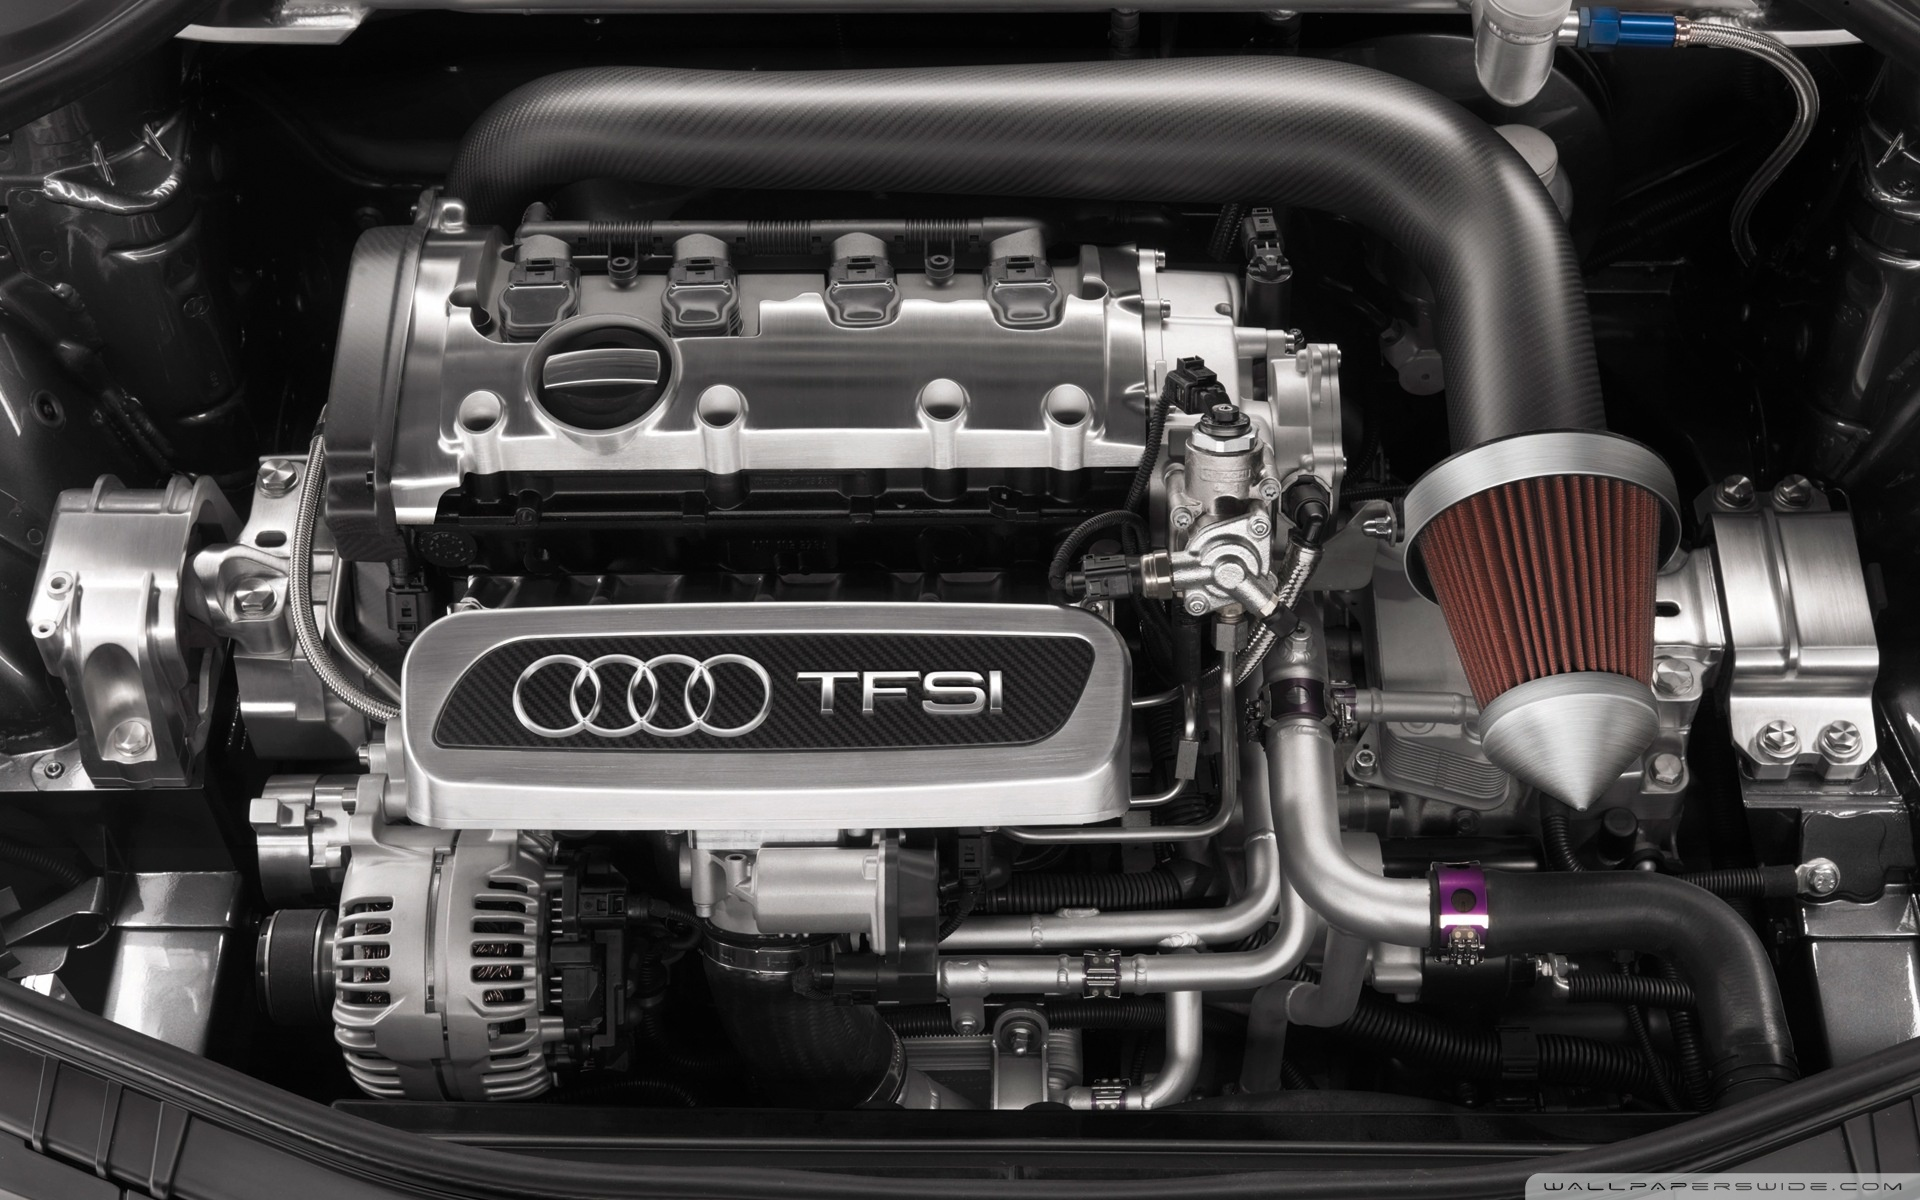 Моторы TFSI впервые использовала на гонках «24 часа Ле Мана»